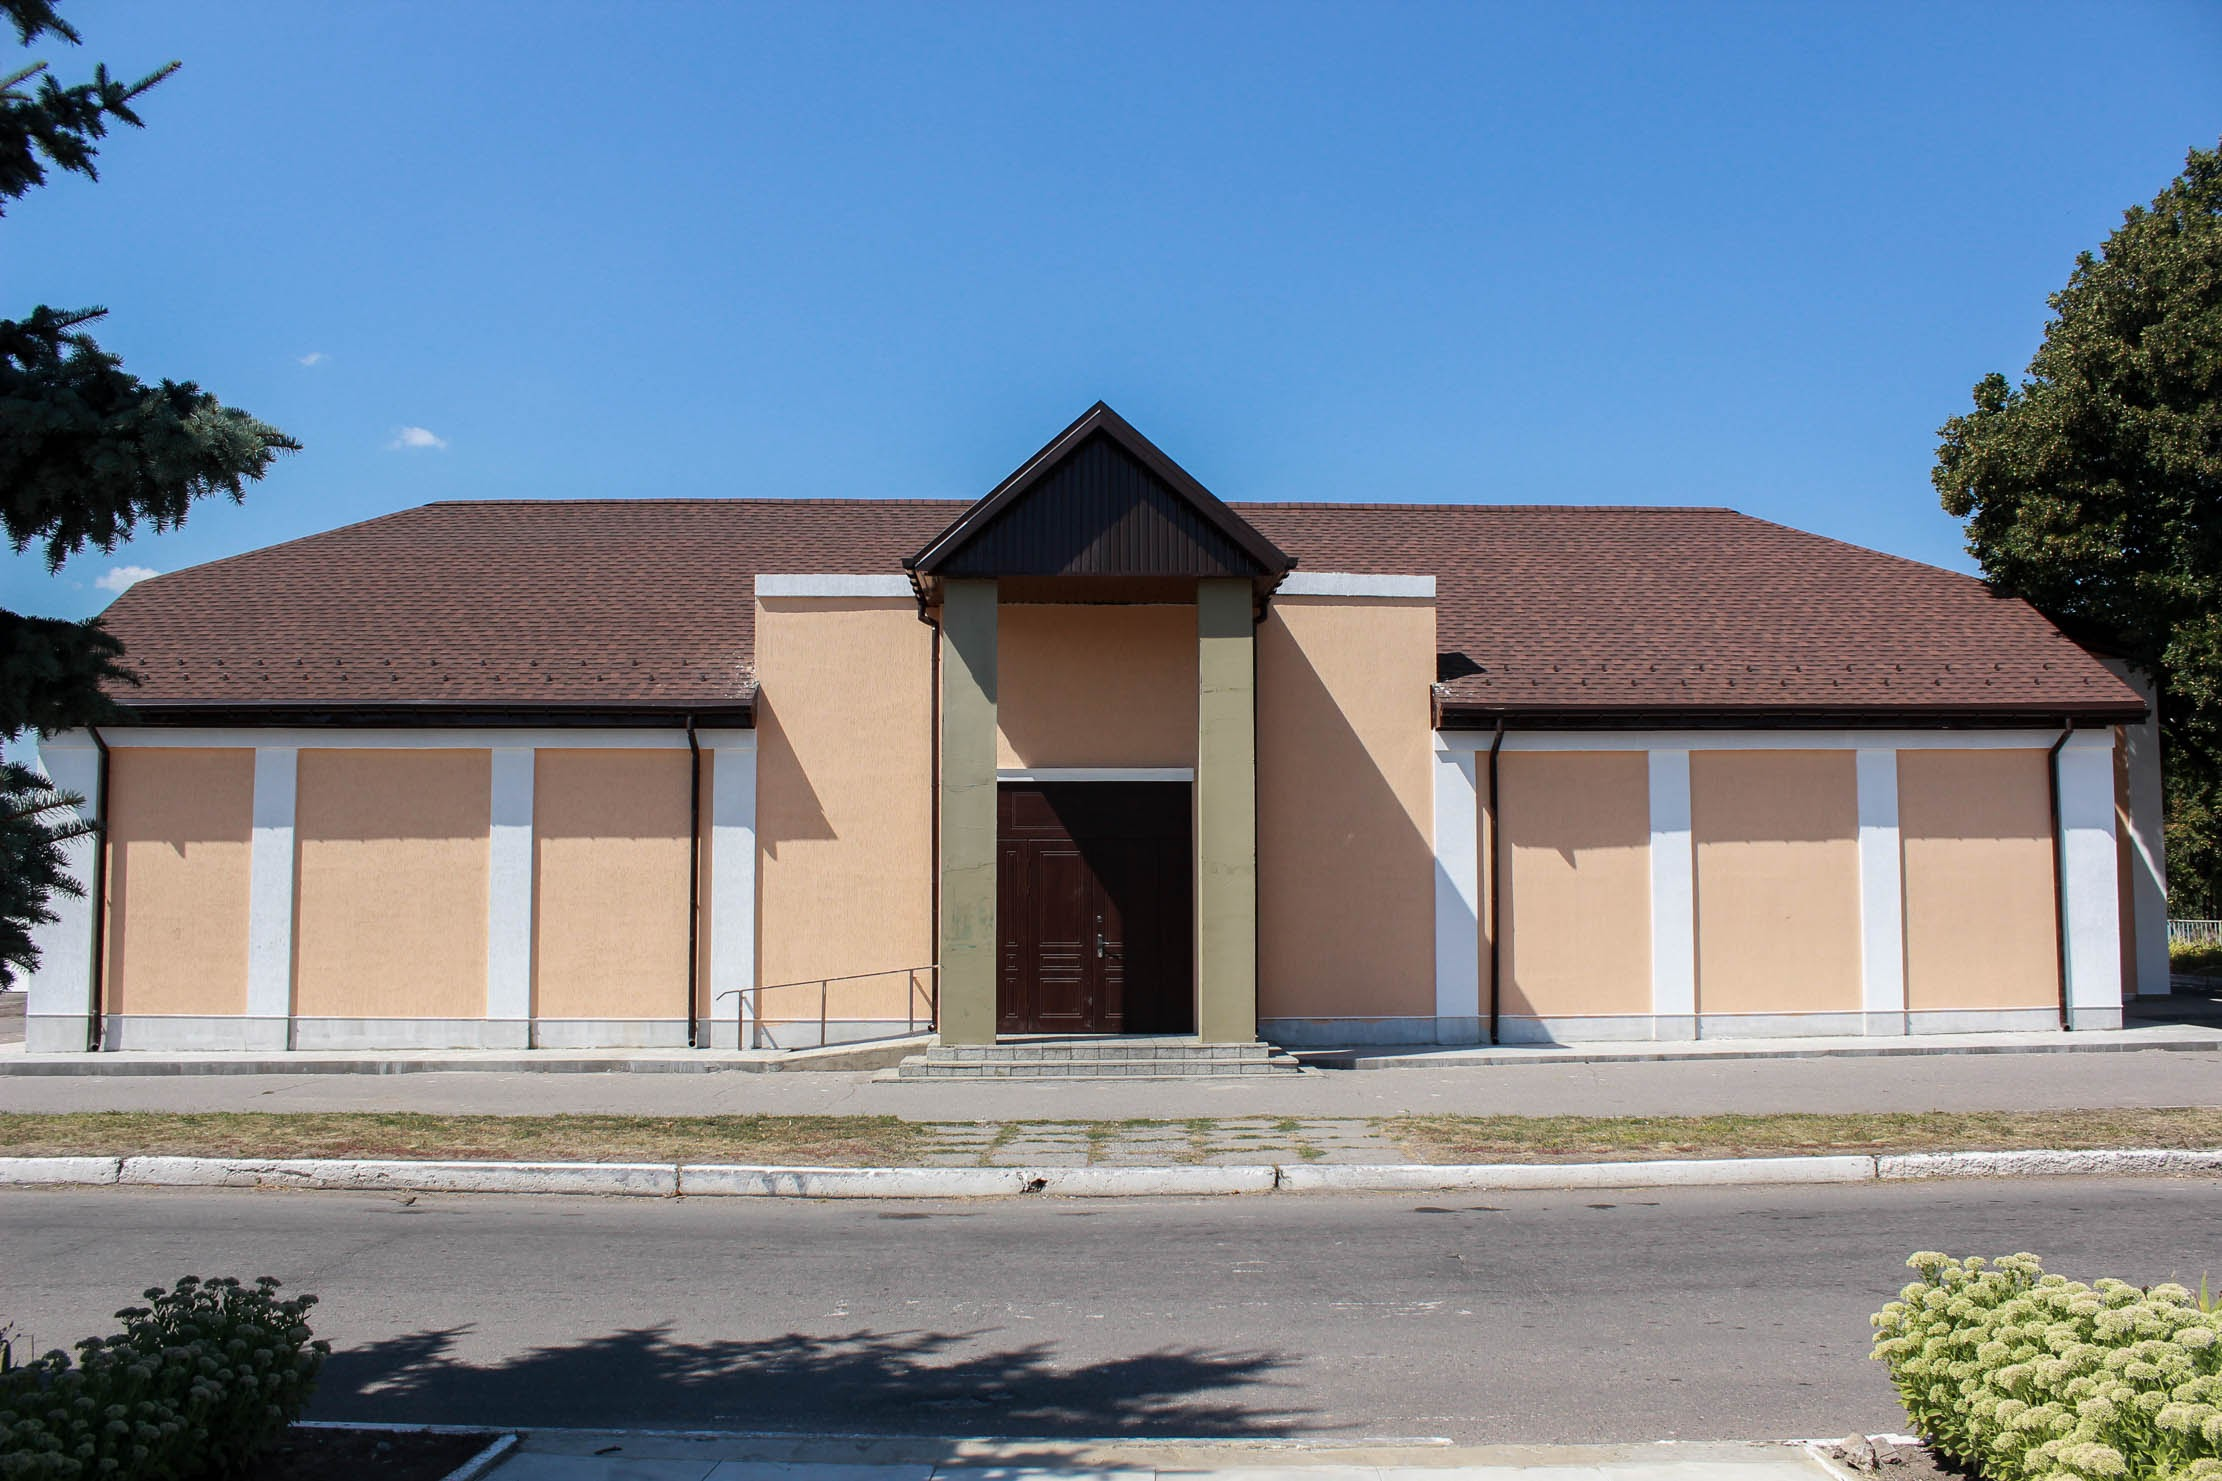 будинок культури, ремонт